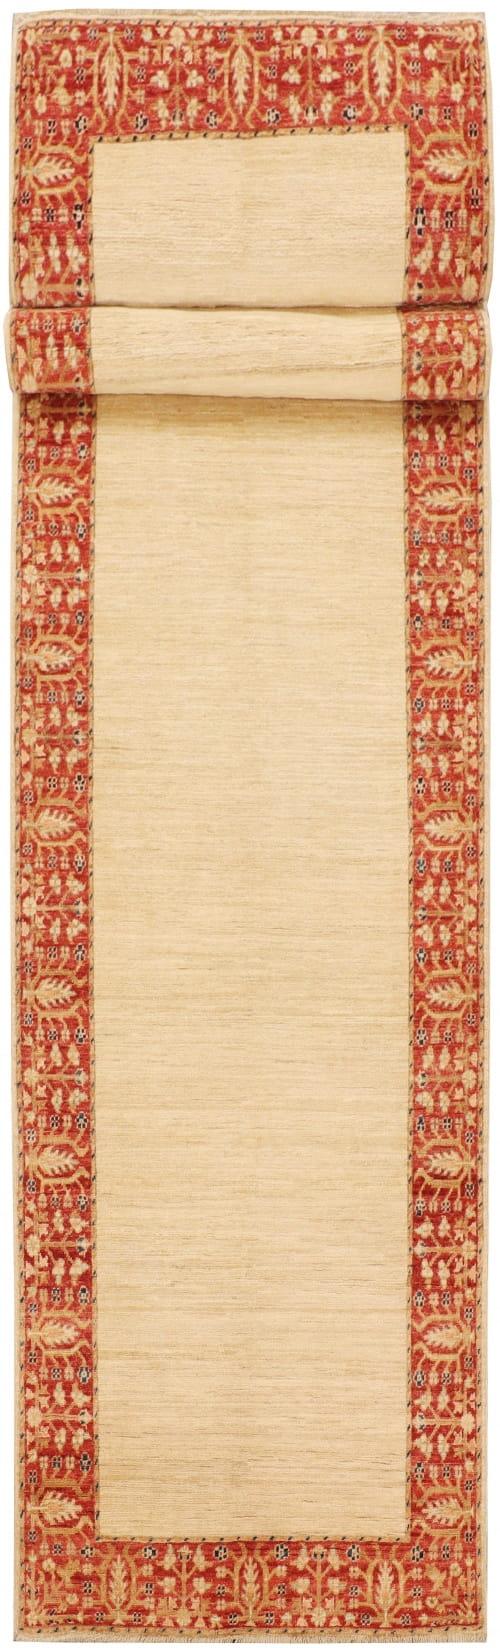 Rug# 26287, Afghan Turkaman,19th c Zigler inspired, Size 385x91 cm (5)